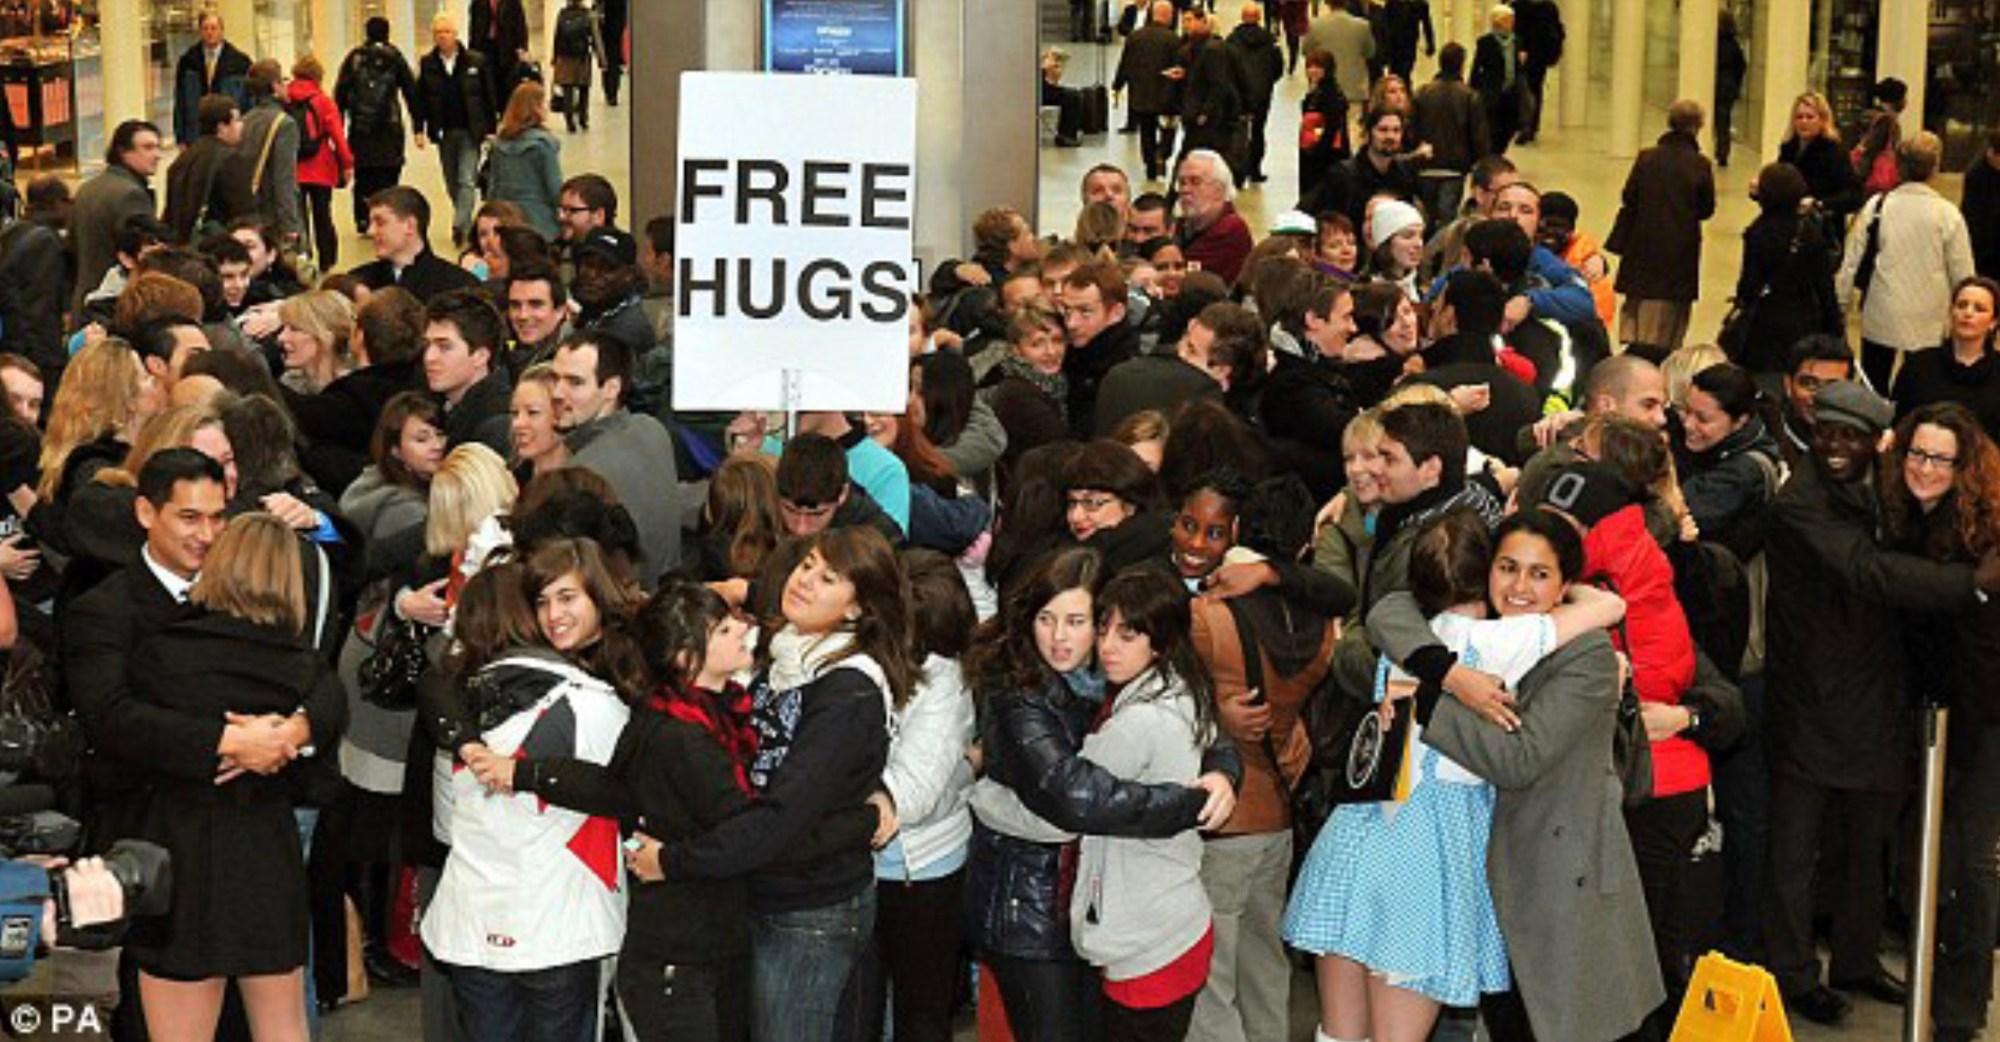 people hugging each other free hugs